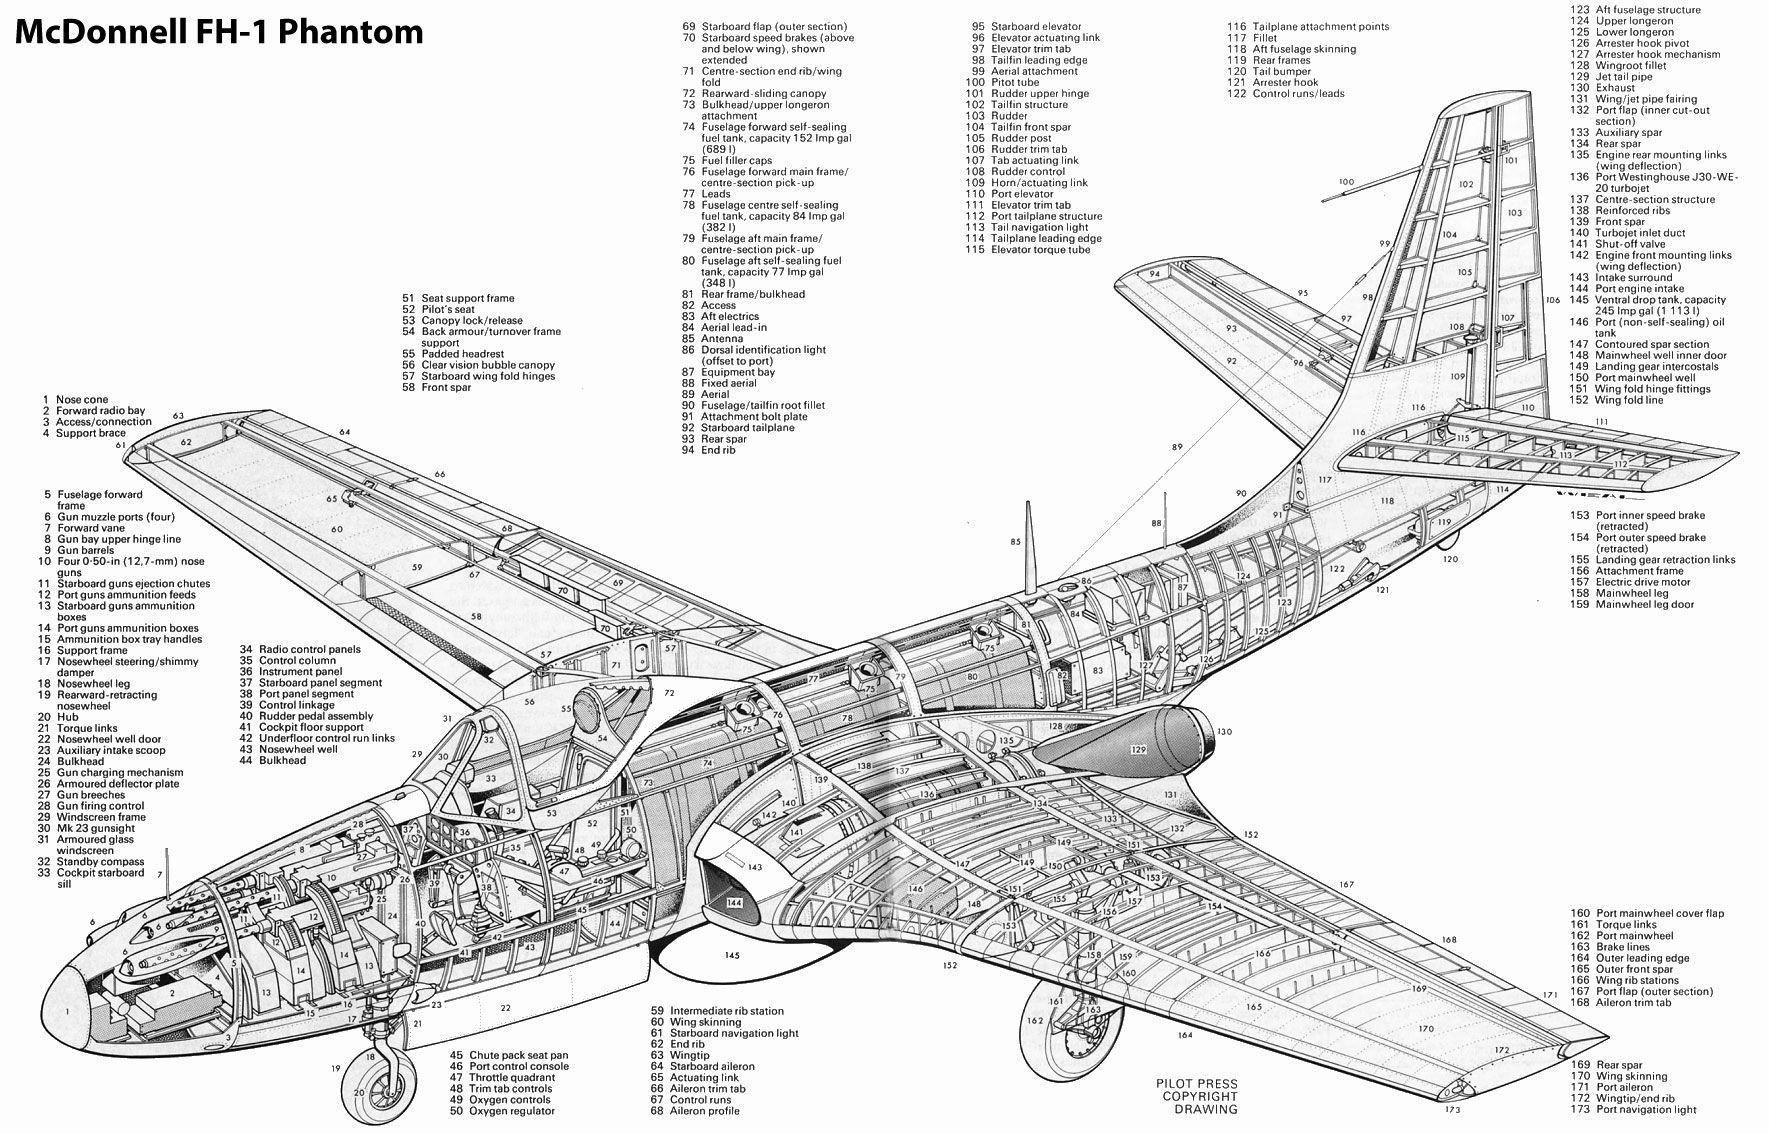 Pin On Aviones